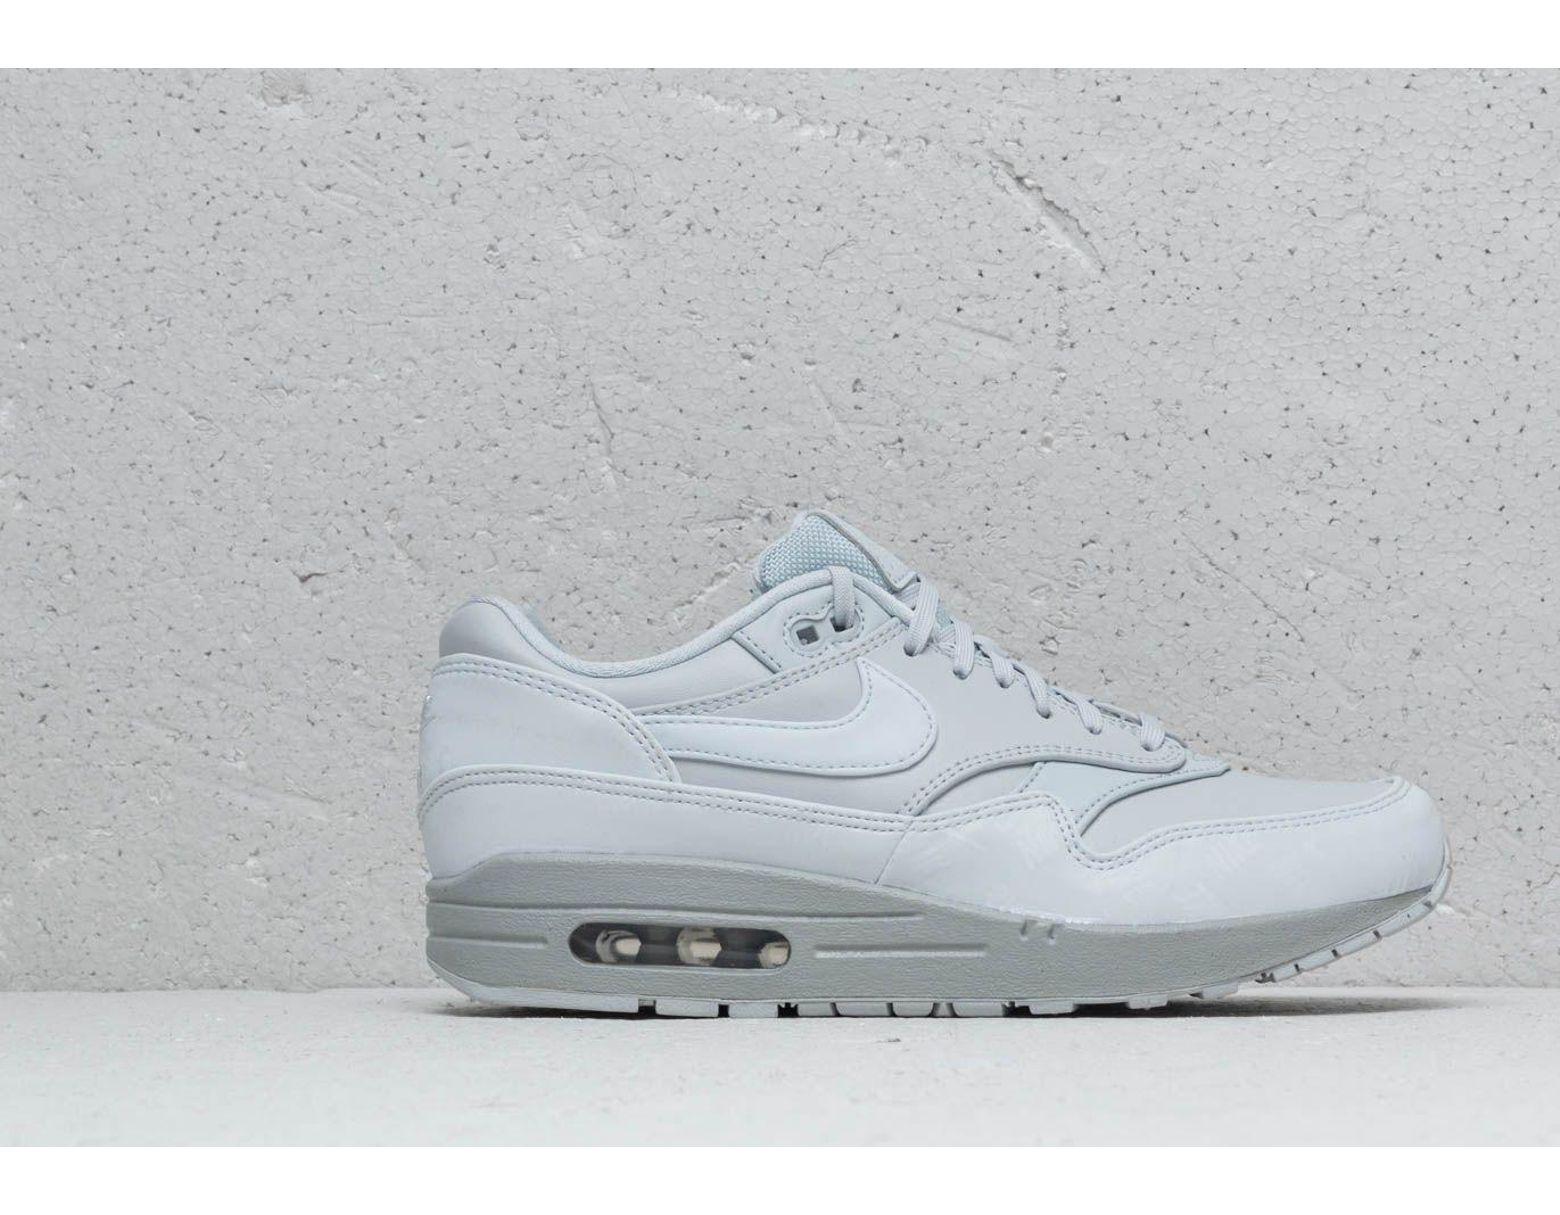 buy online 2922c 7398f Lyst - Nike Wmns Air Max 1 Lx Pure Platinum  Pure Platinum